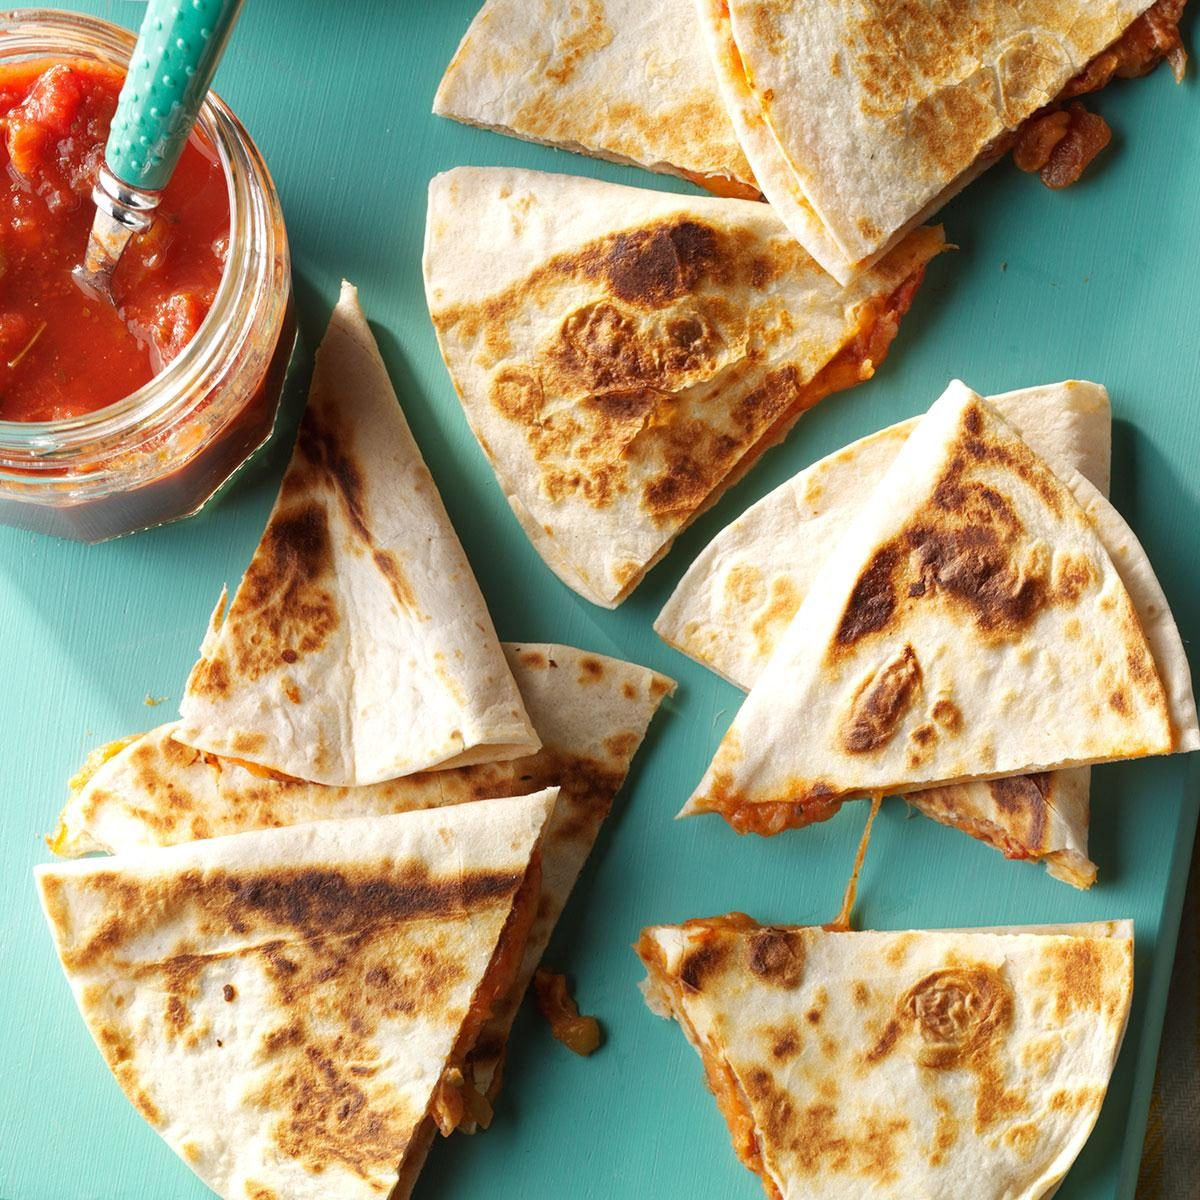 Middle School Age: Cheesy Quesadillas